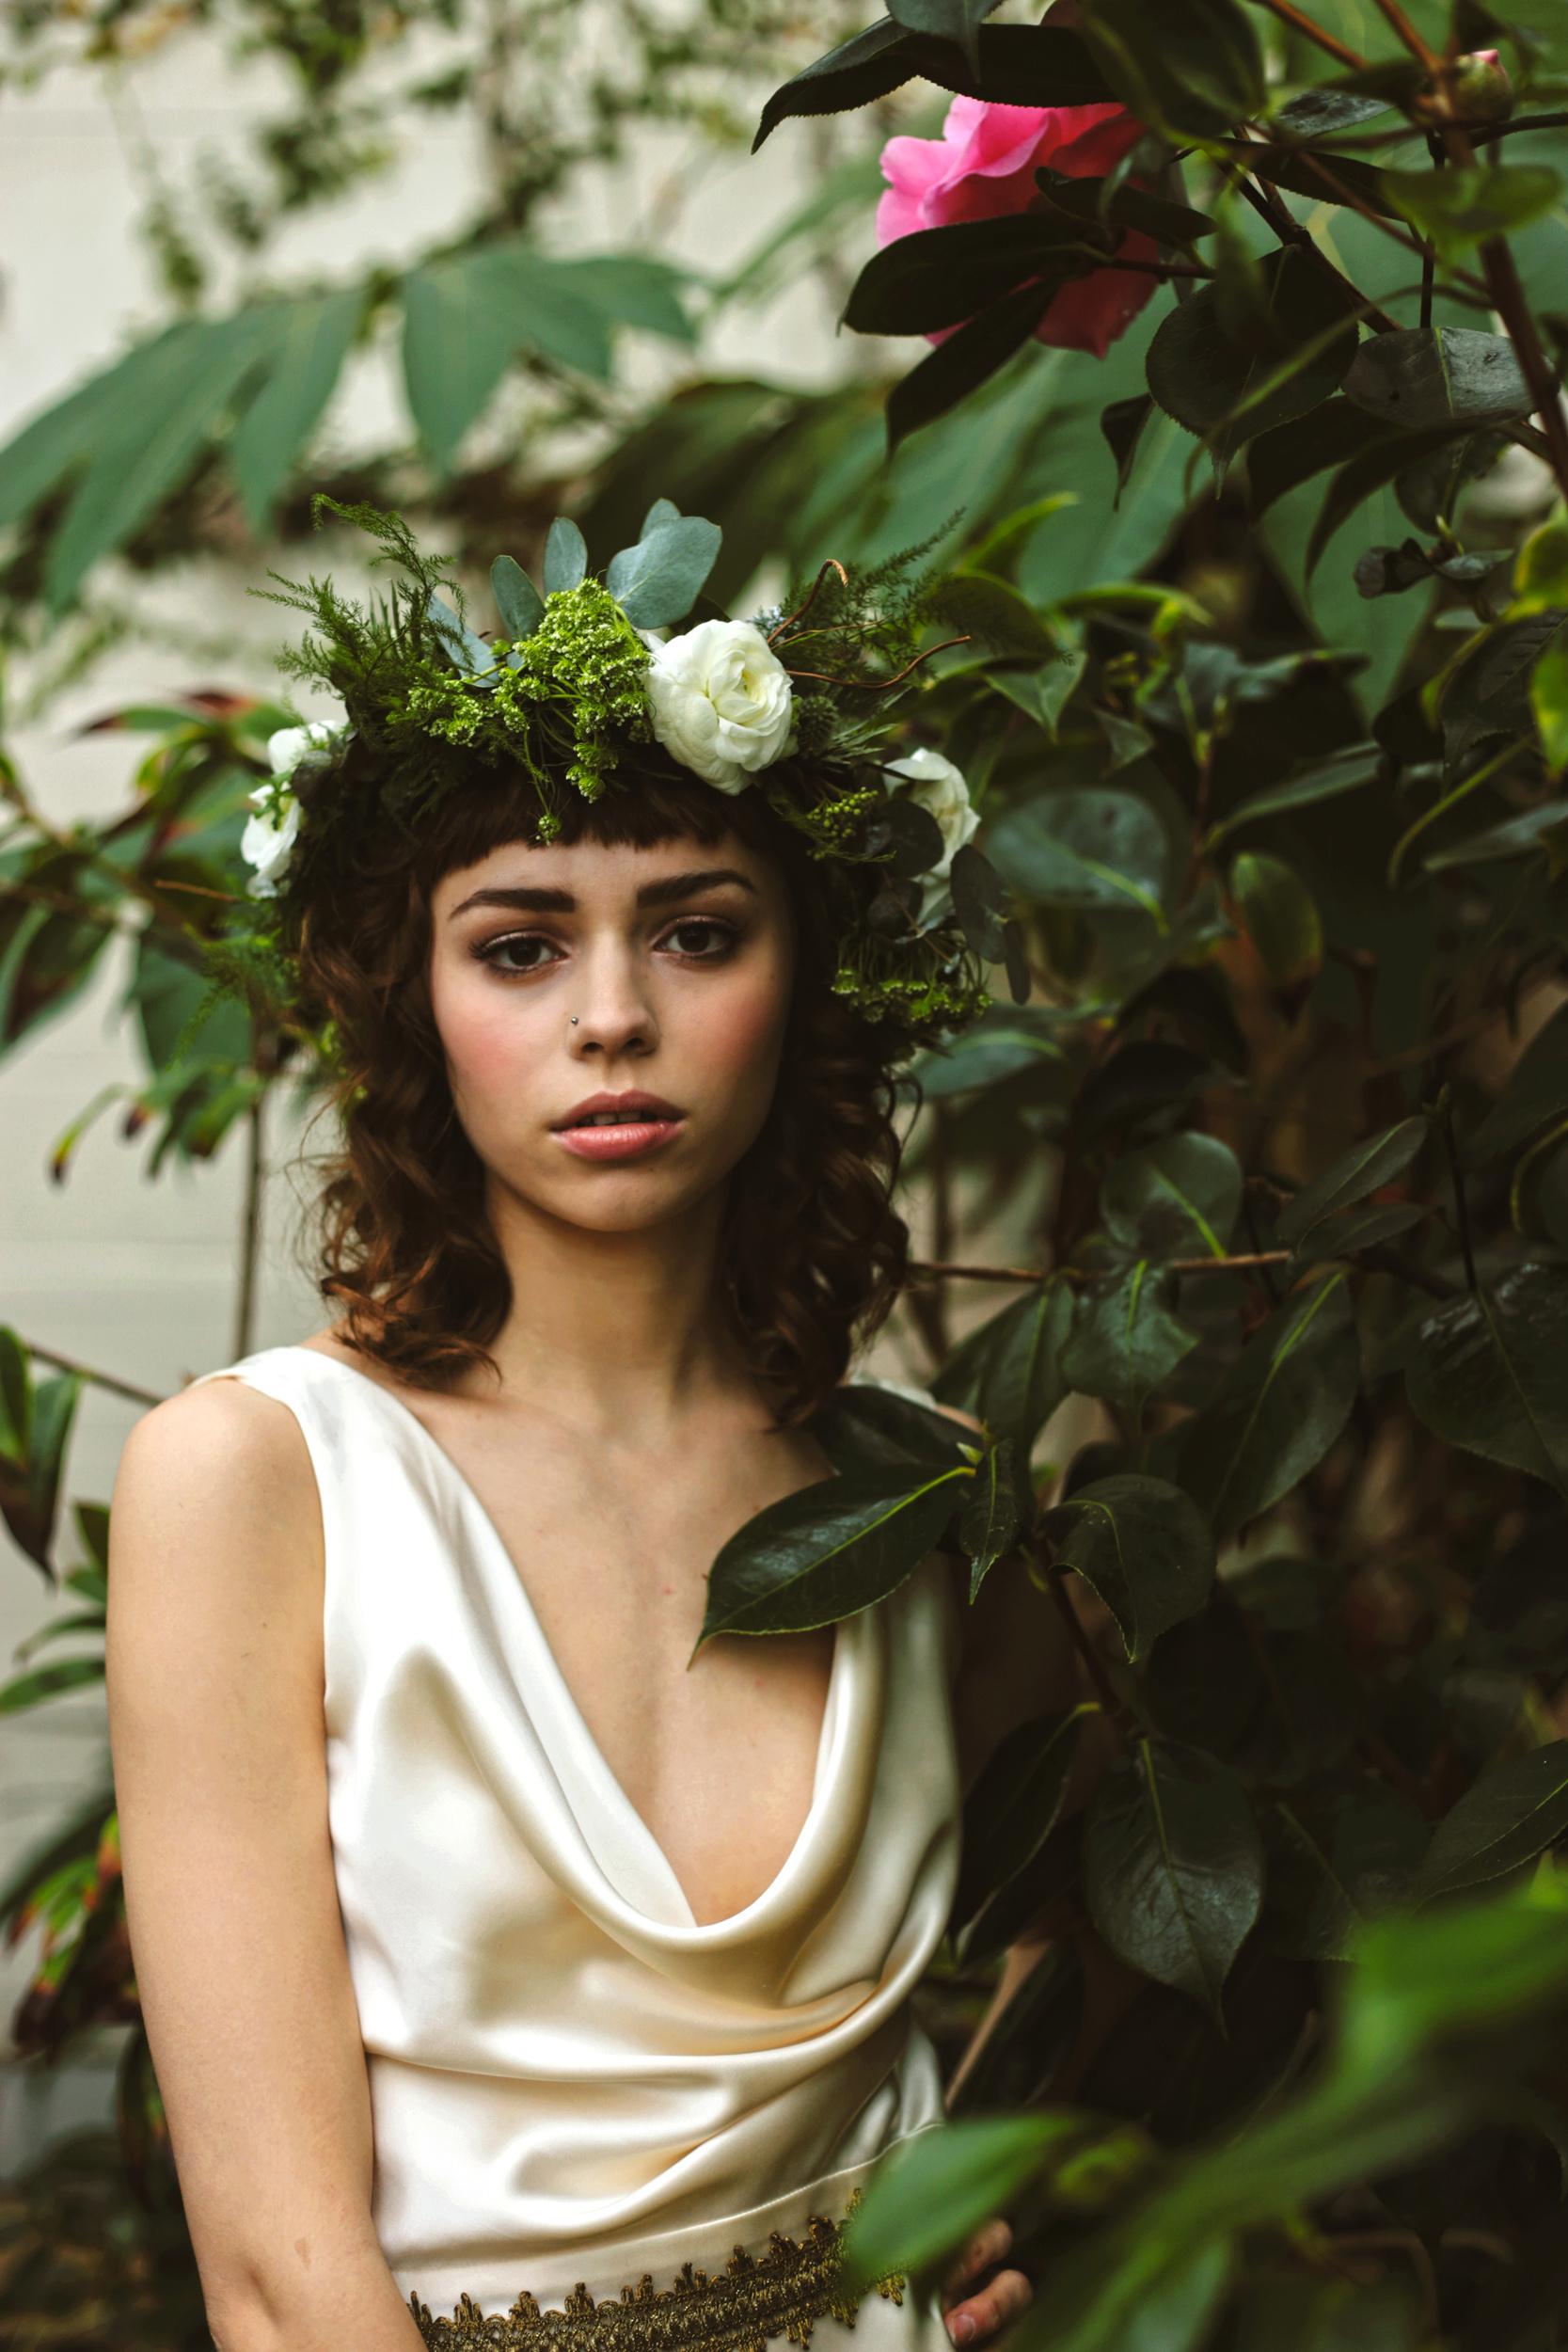 Winter-Bridal-Kate-Beaumont-Shelley-Richmond-Vintage-Wedding-Dress-4.jpg